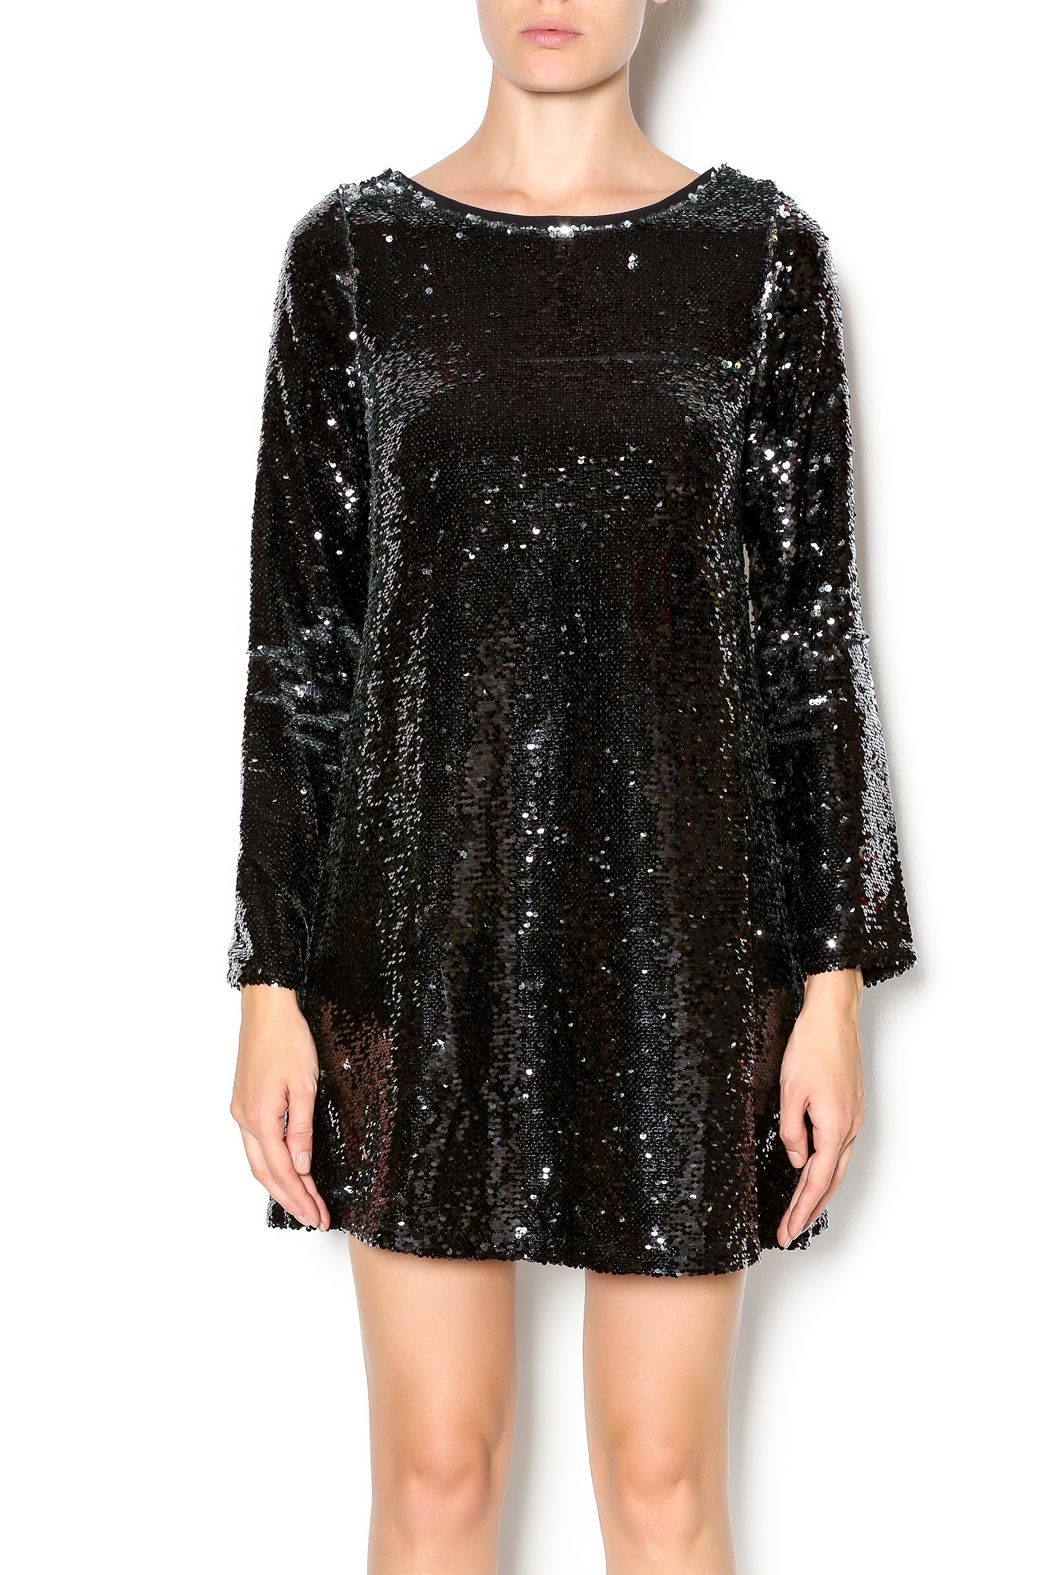 Double zero long sleeve sequin dress zero clothing sequins and